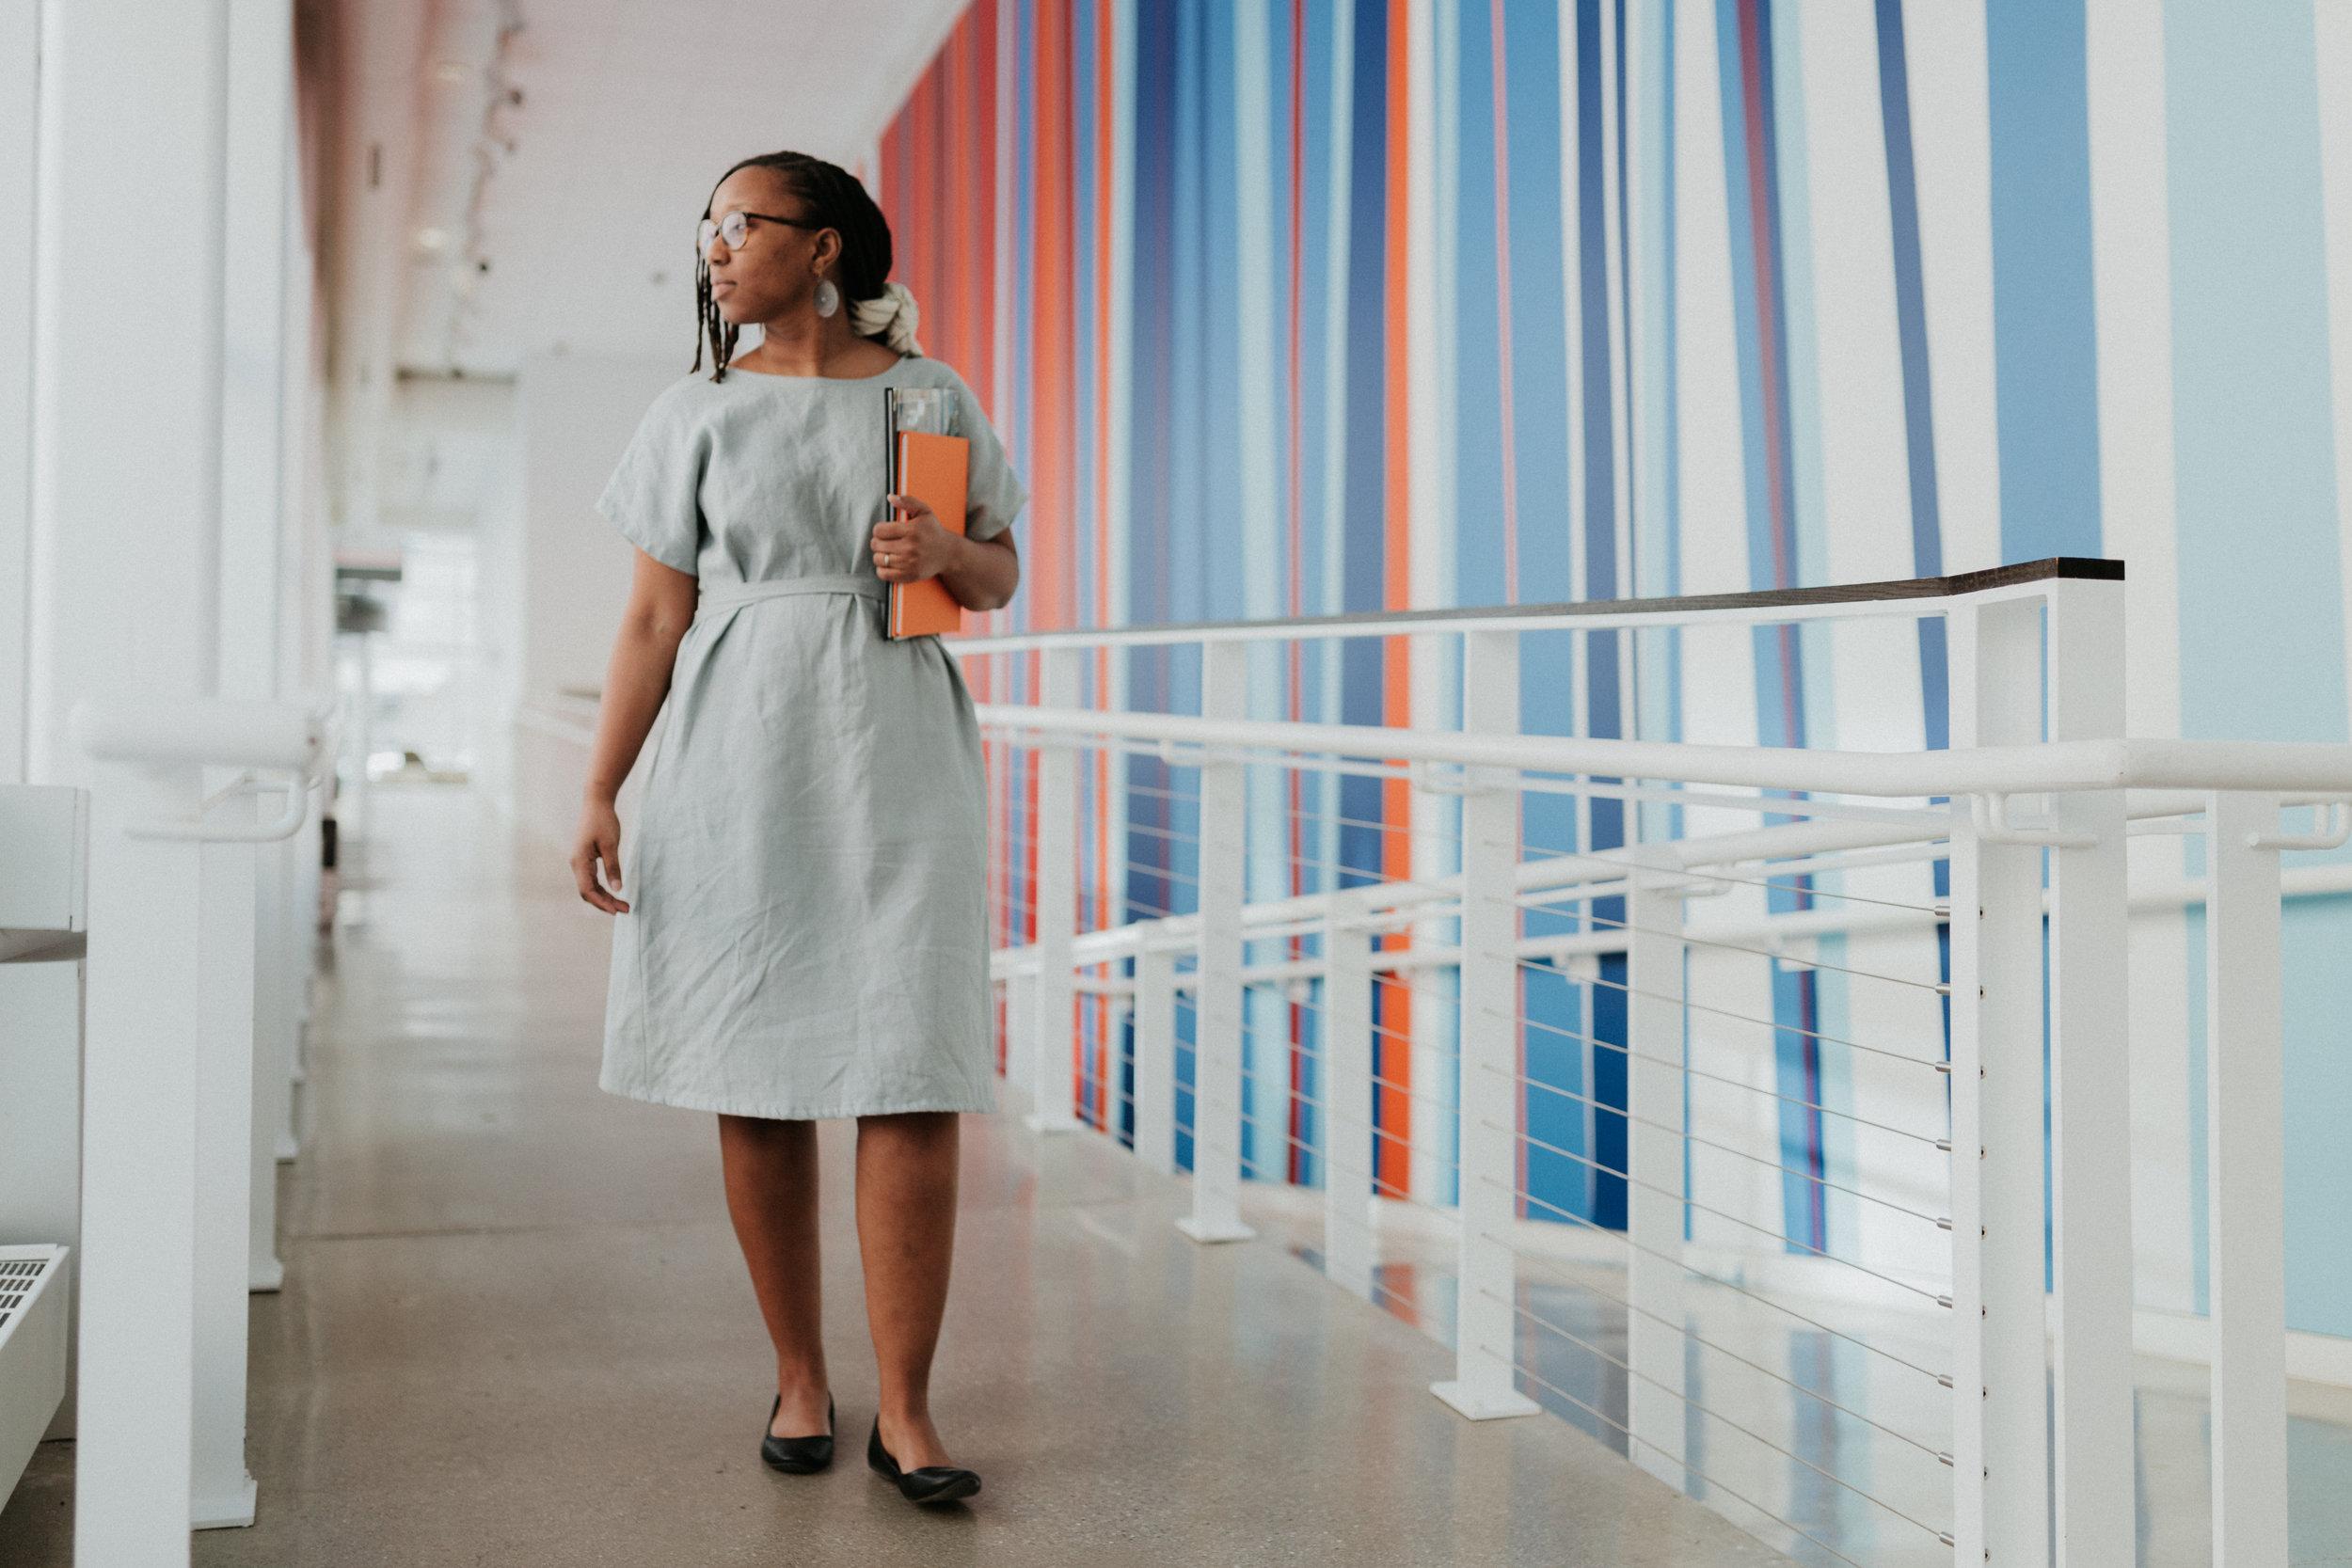 Juana - Curator at the Urban Instituste of Contemporary Art